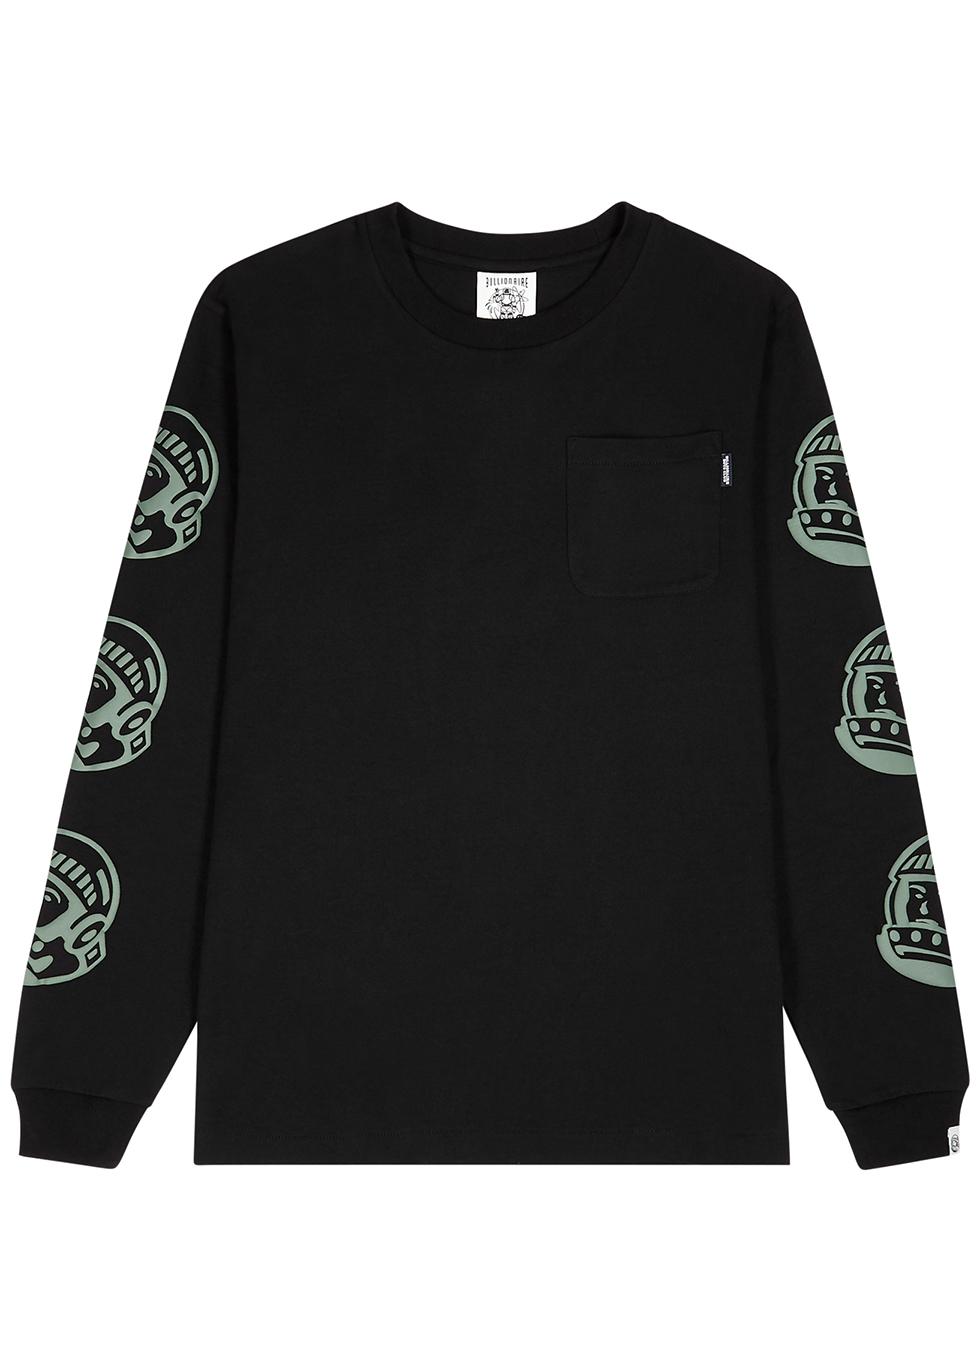 Astro repeat black cotton T-shirt